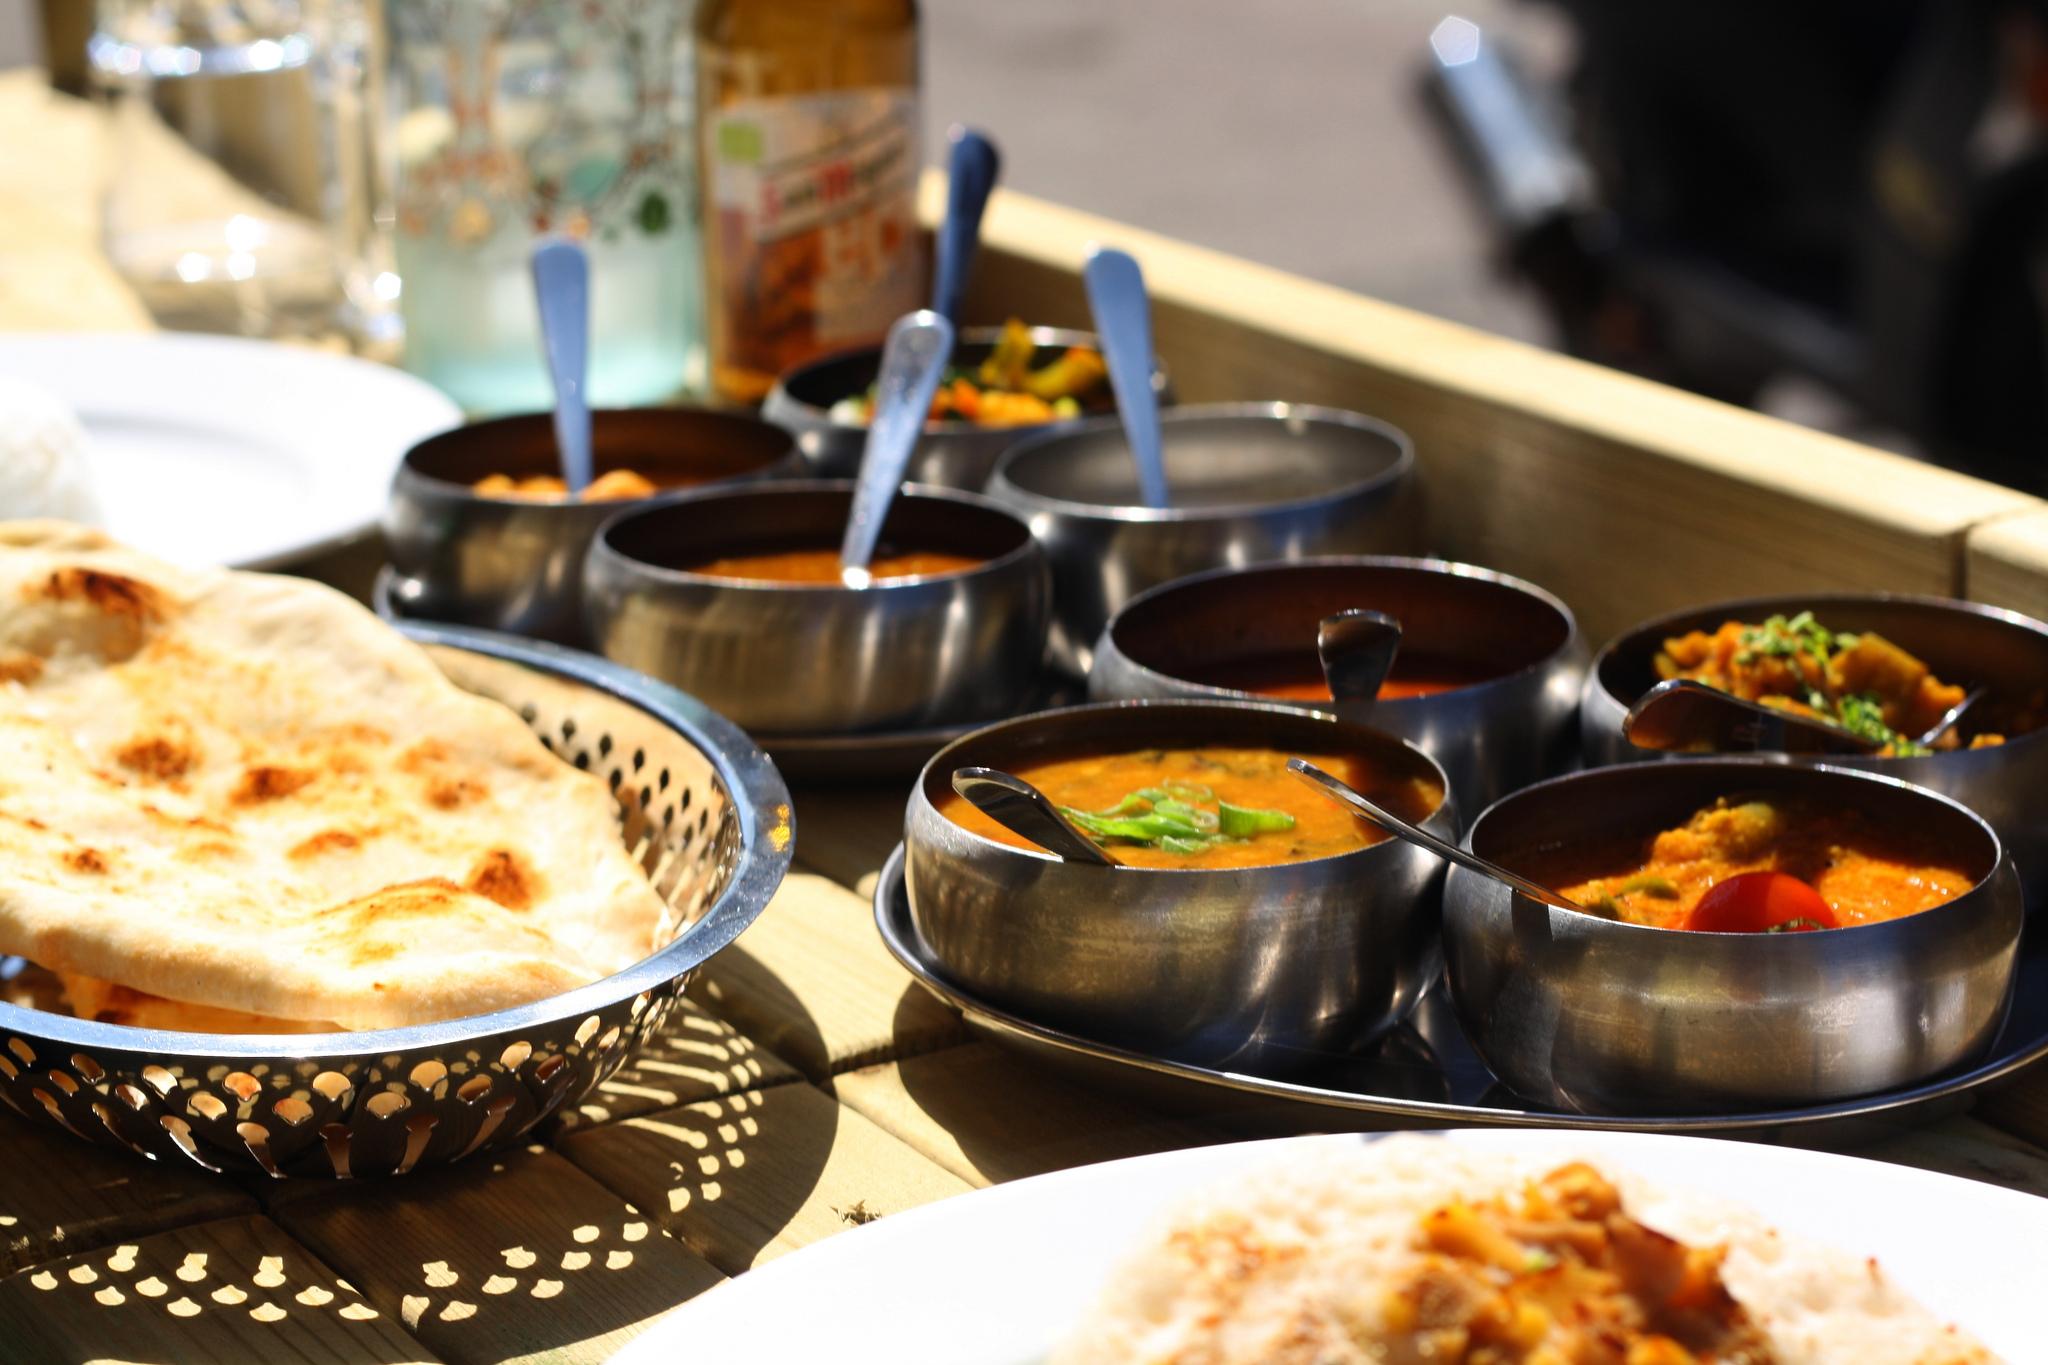 Indian buffet I © Blondinrikard Fröberg / Flickr